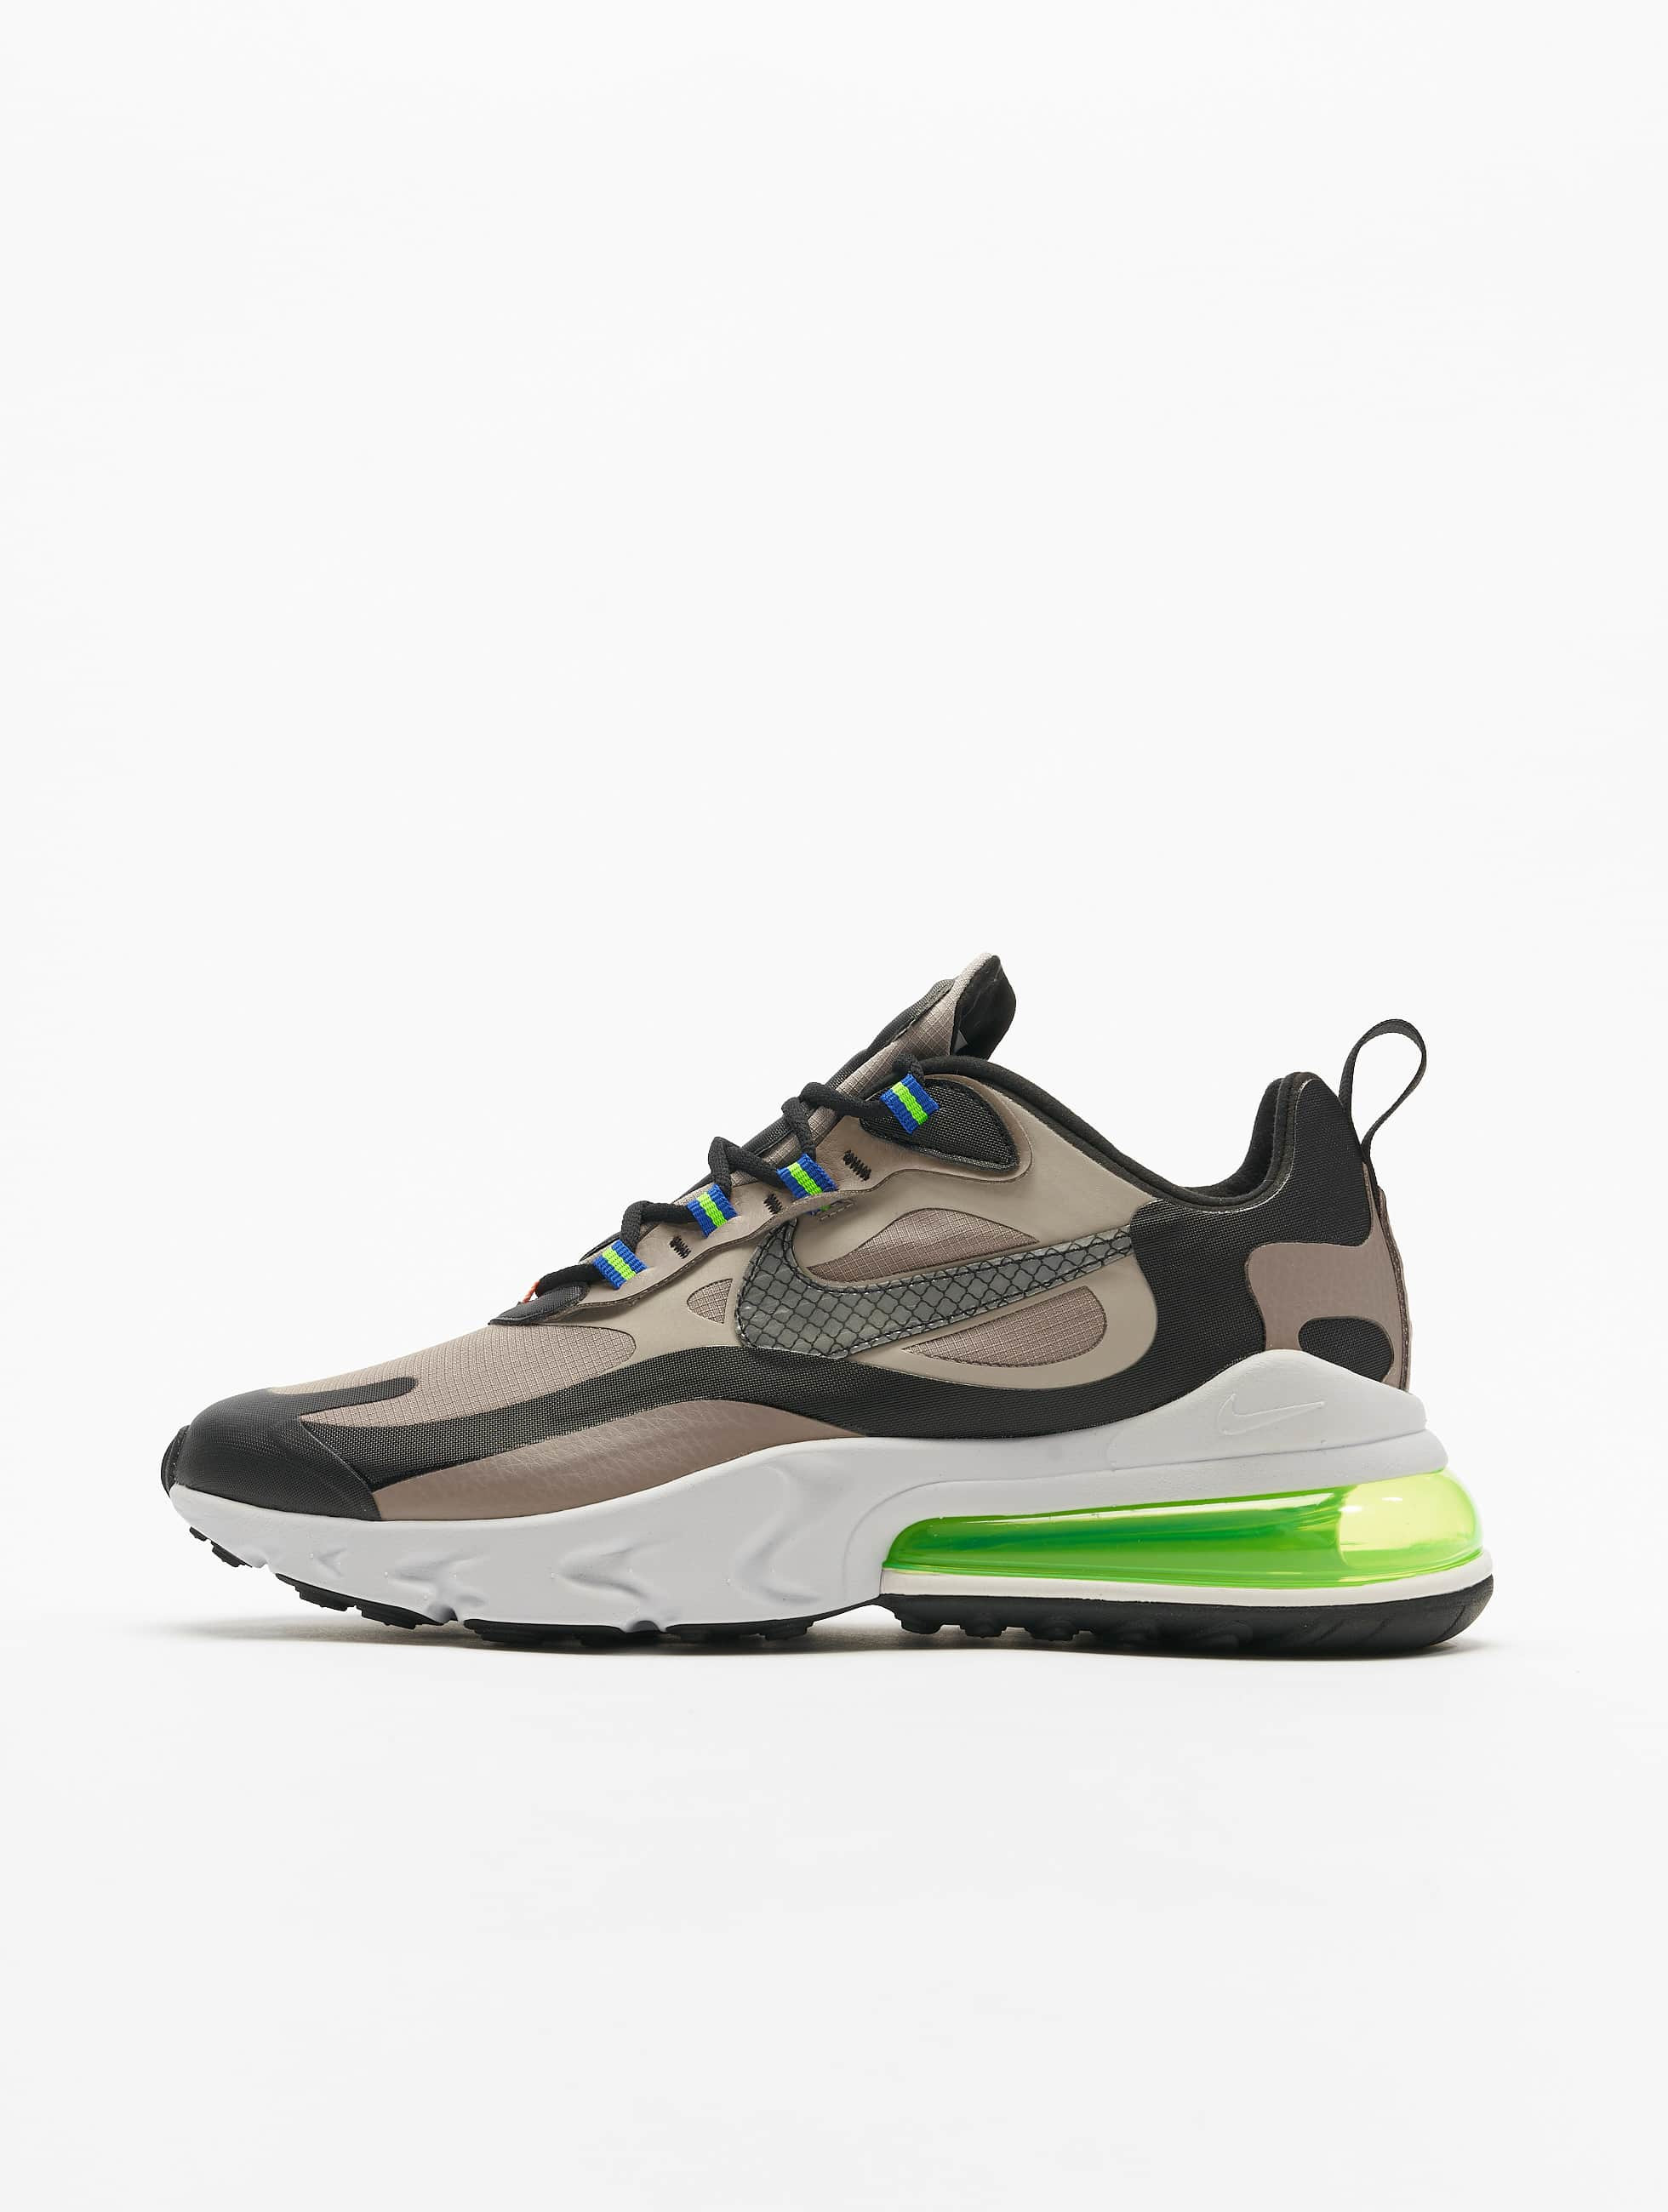 Nike Air Max 270 React WTR Sneakers Sepia StoneBlackMoon Particle